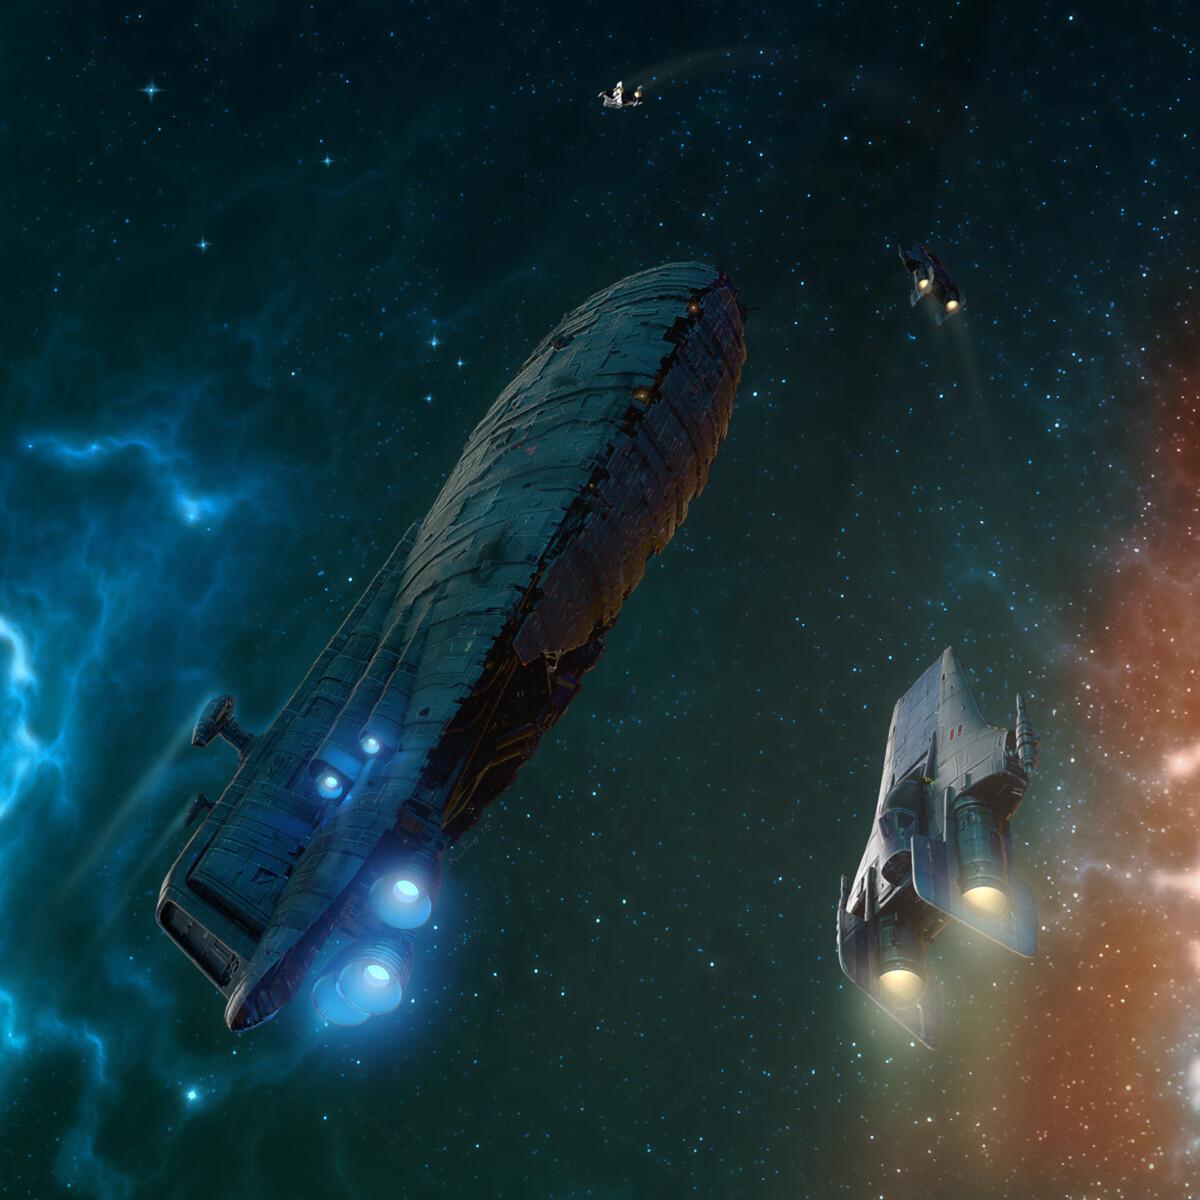 R-22 Spearheads escort a rebel transport through a nebula.